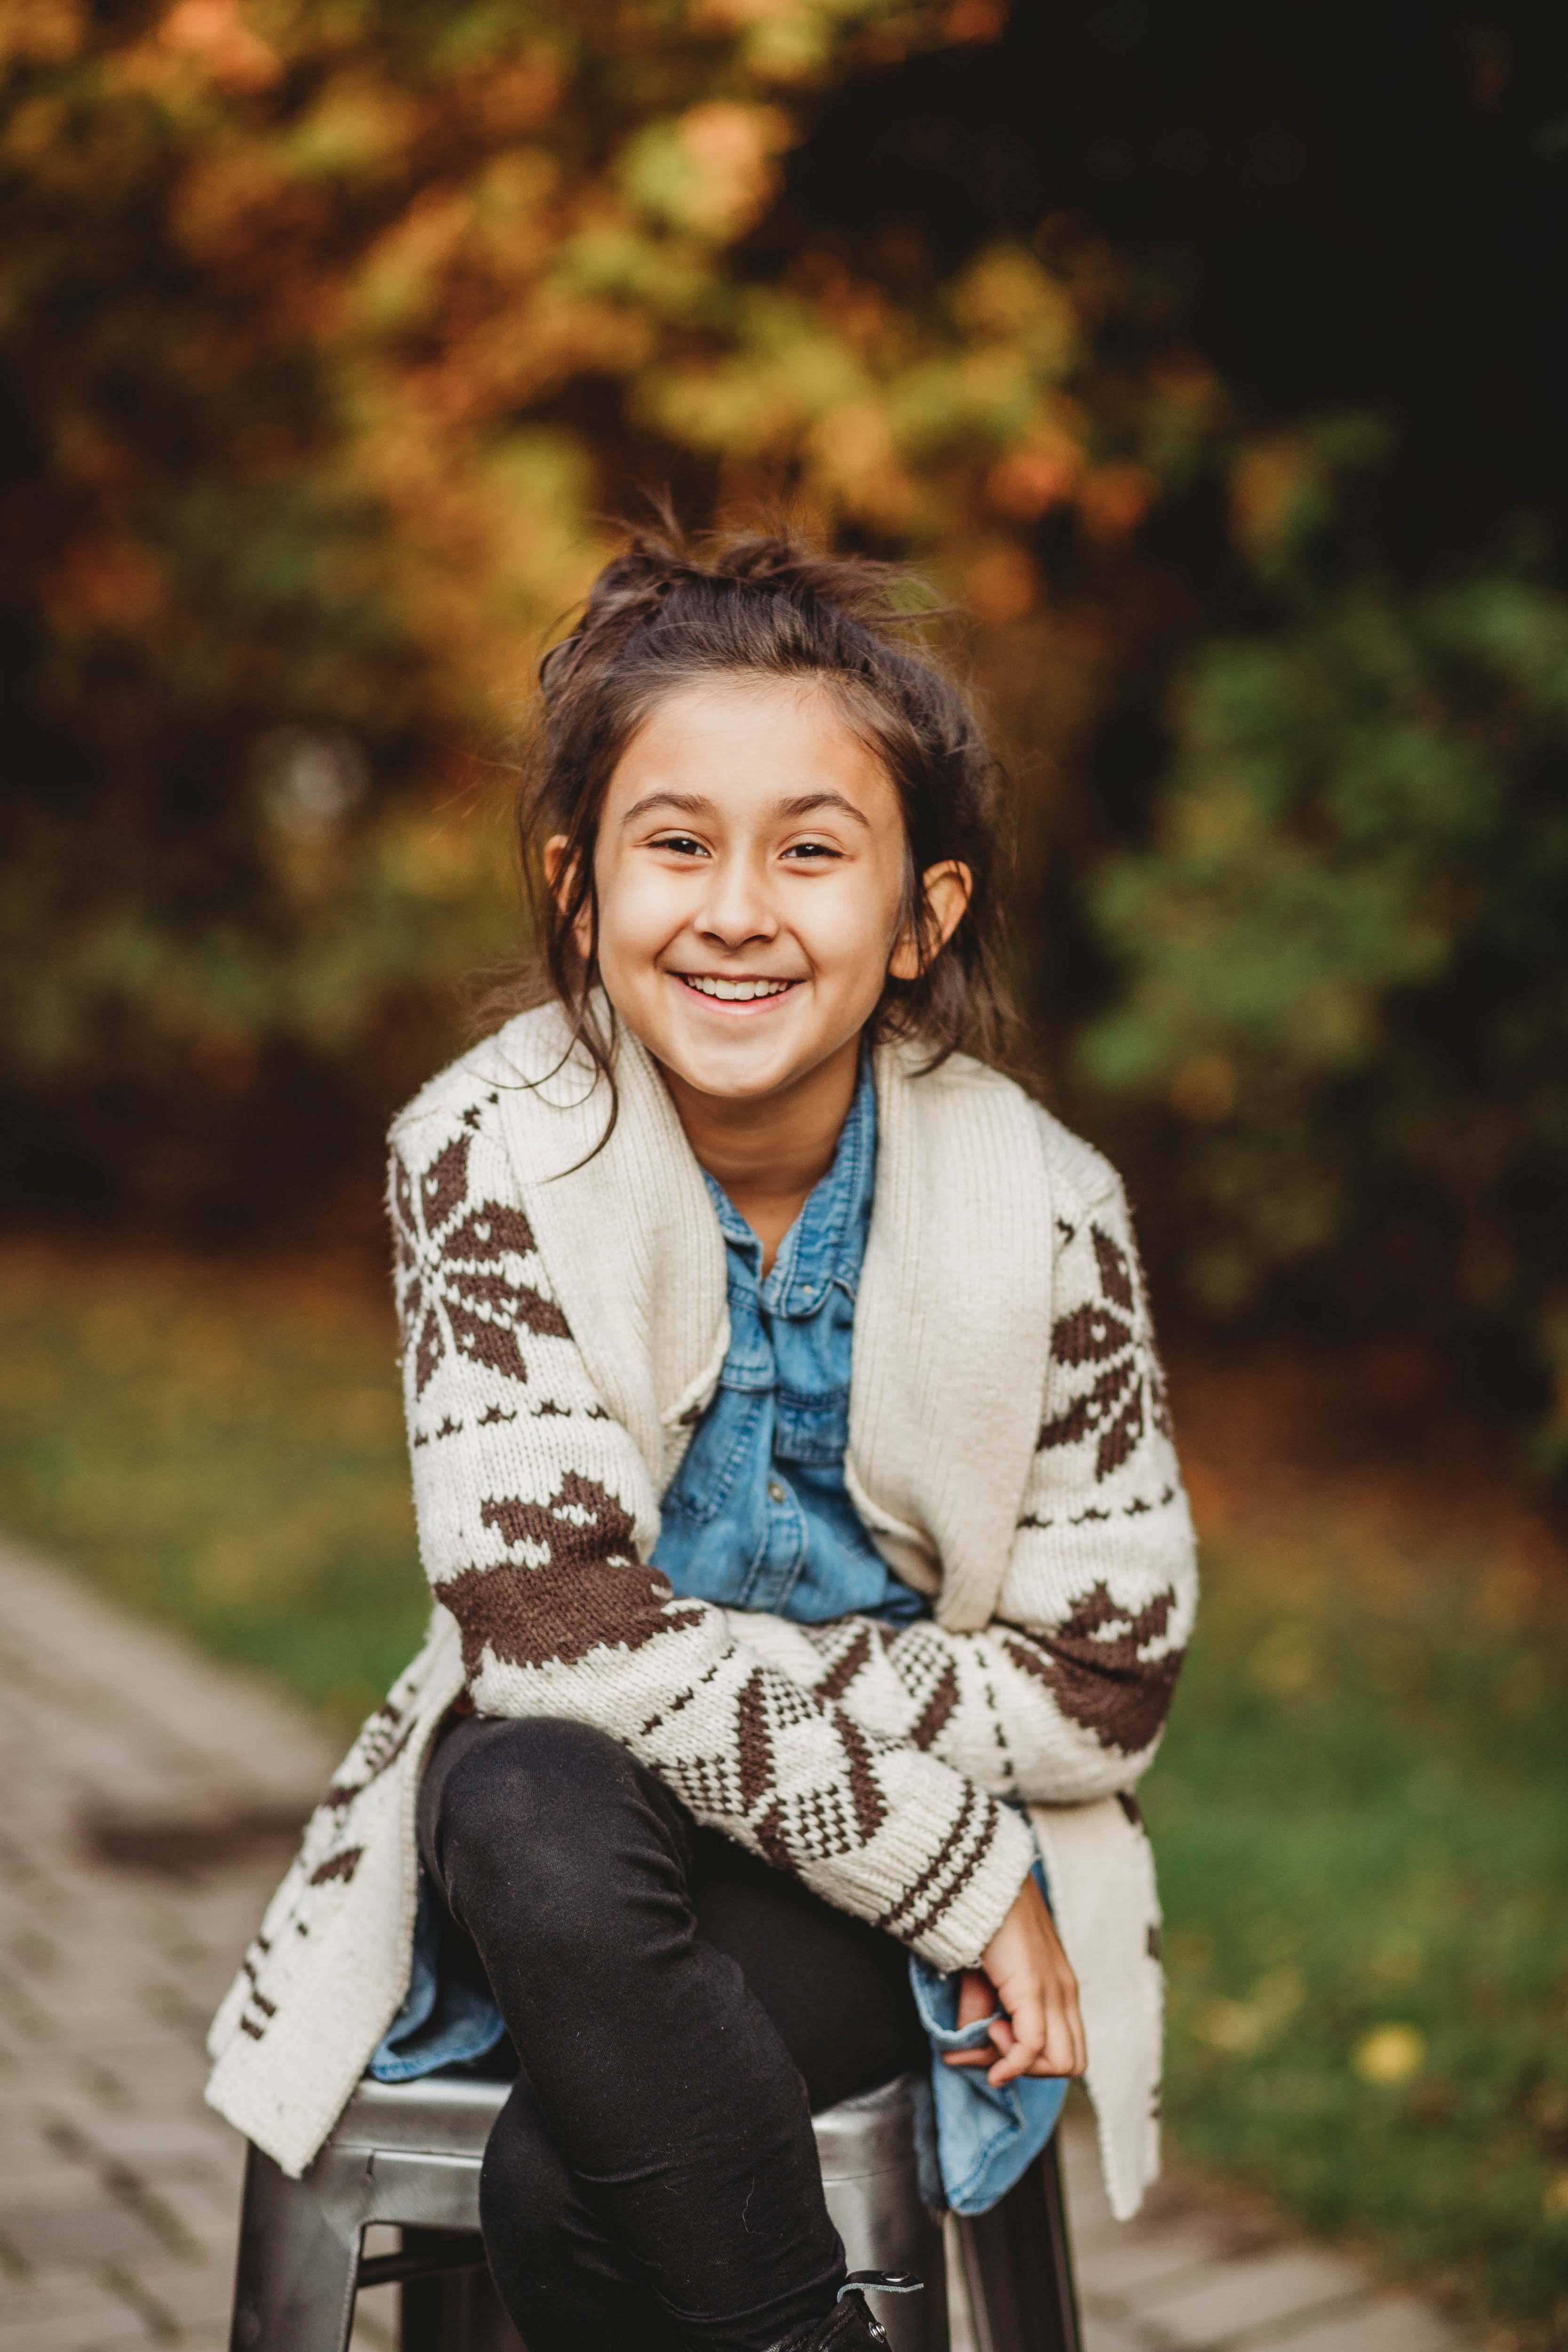 School Portraits - Children's Portraits